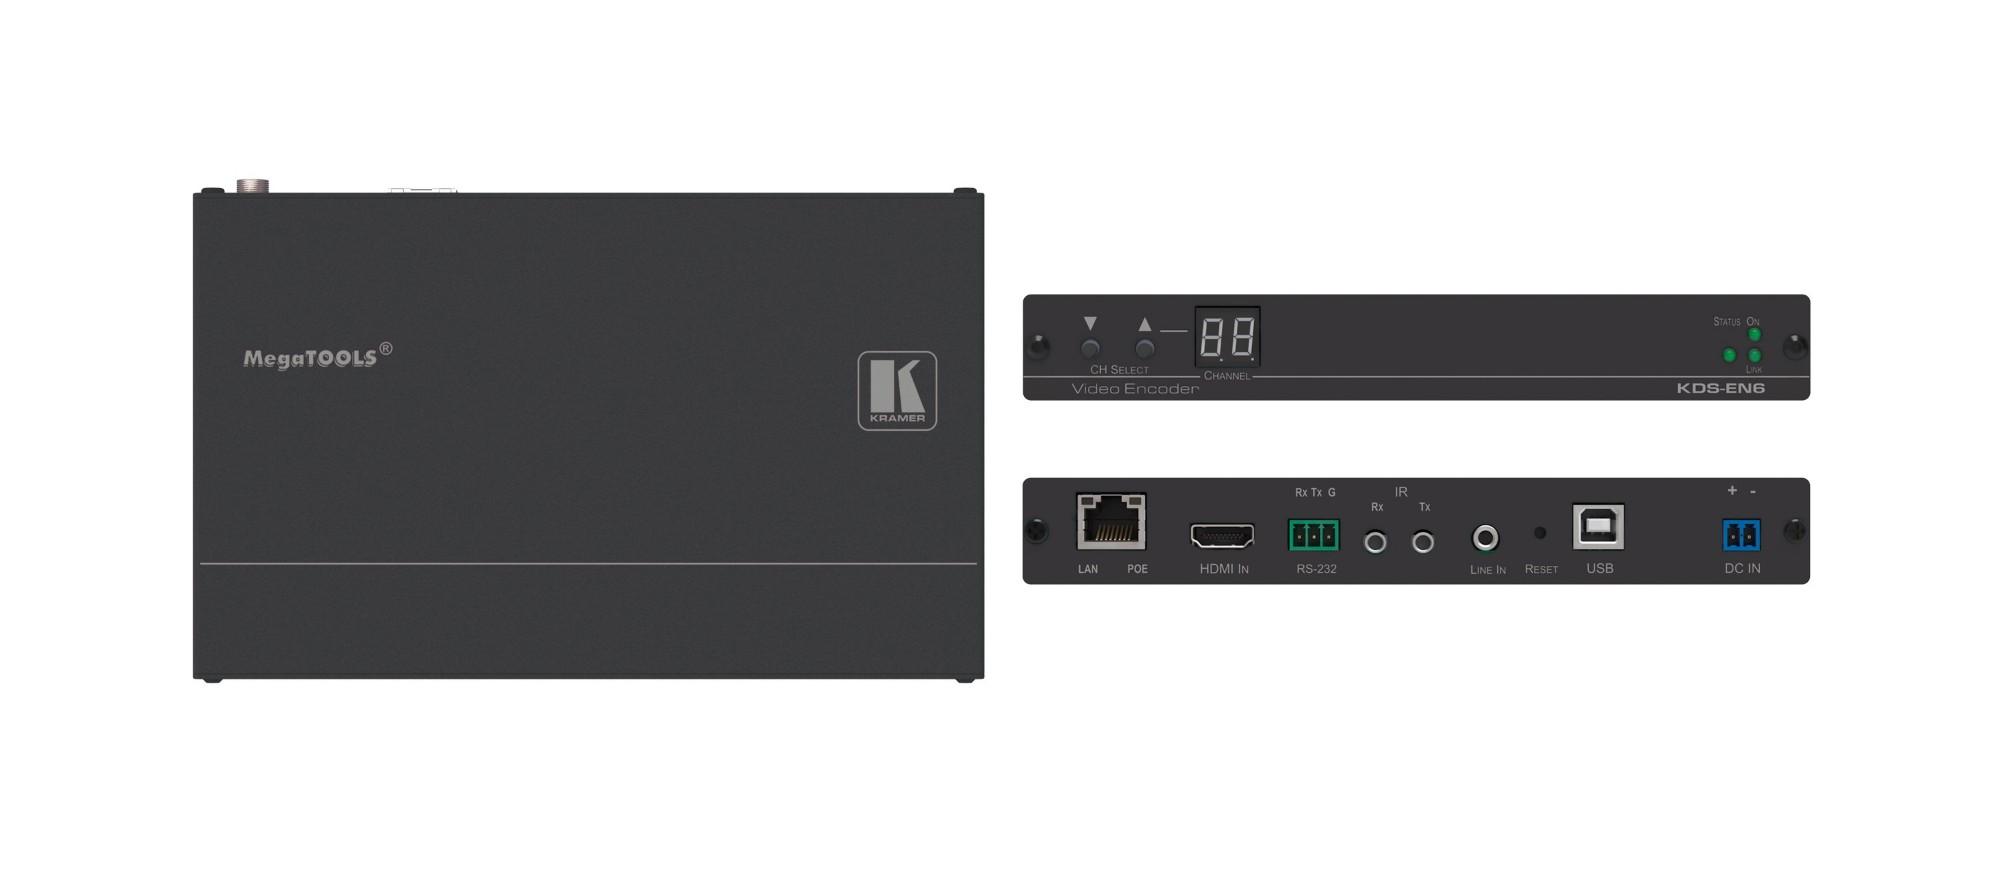 Kramer Electronics KDS-EN6 extensor audio/video Receptor AV Negro